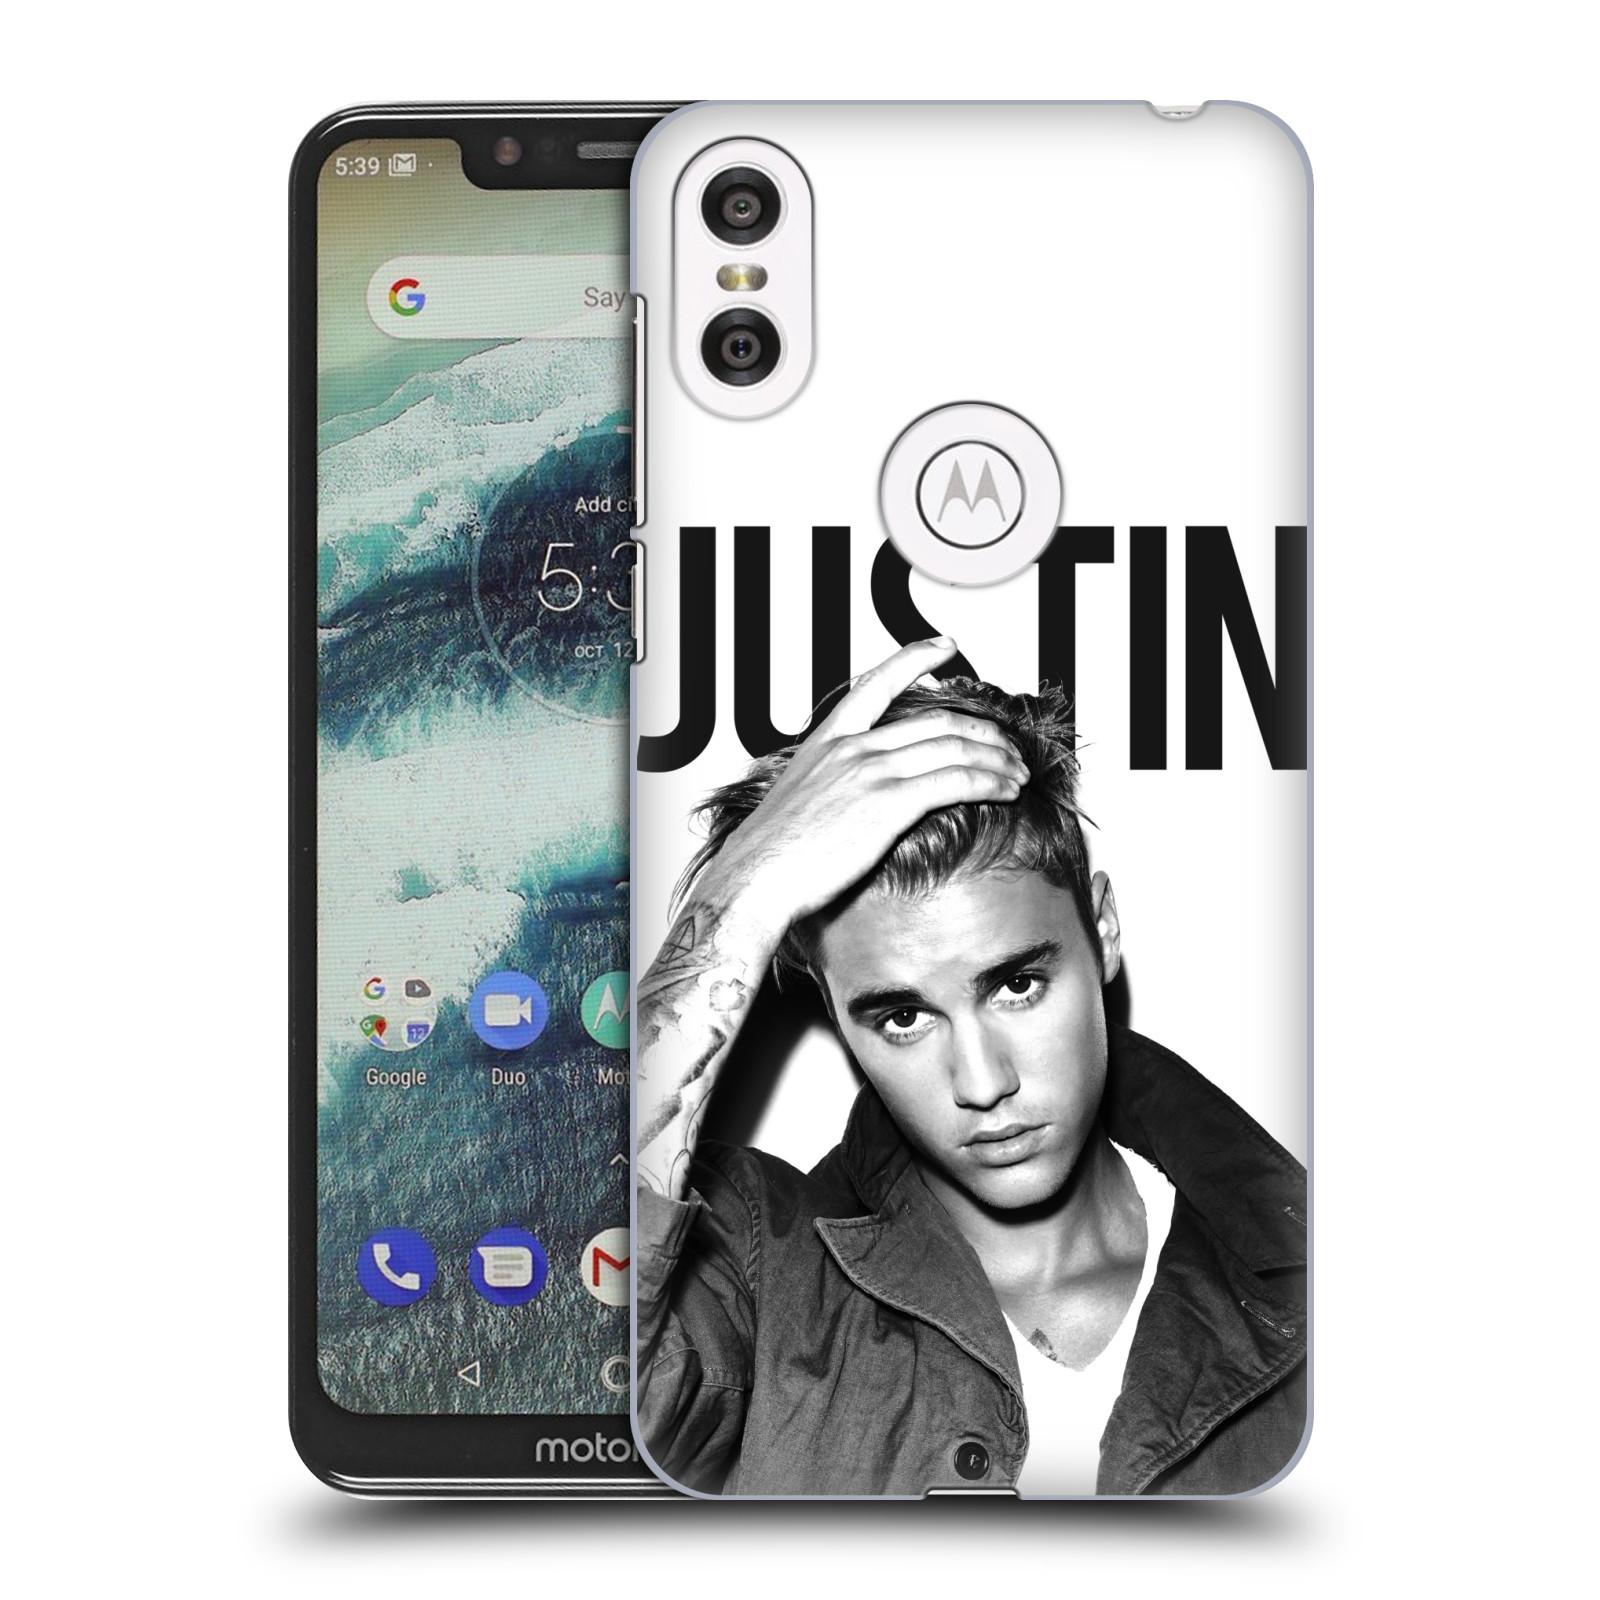 Plastové pouzdro na mobil Motorola One - Head Case - Justin Bieber Official - Póza